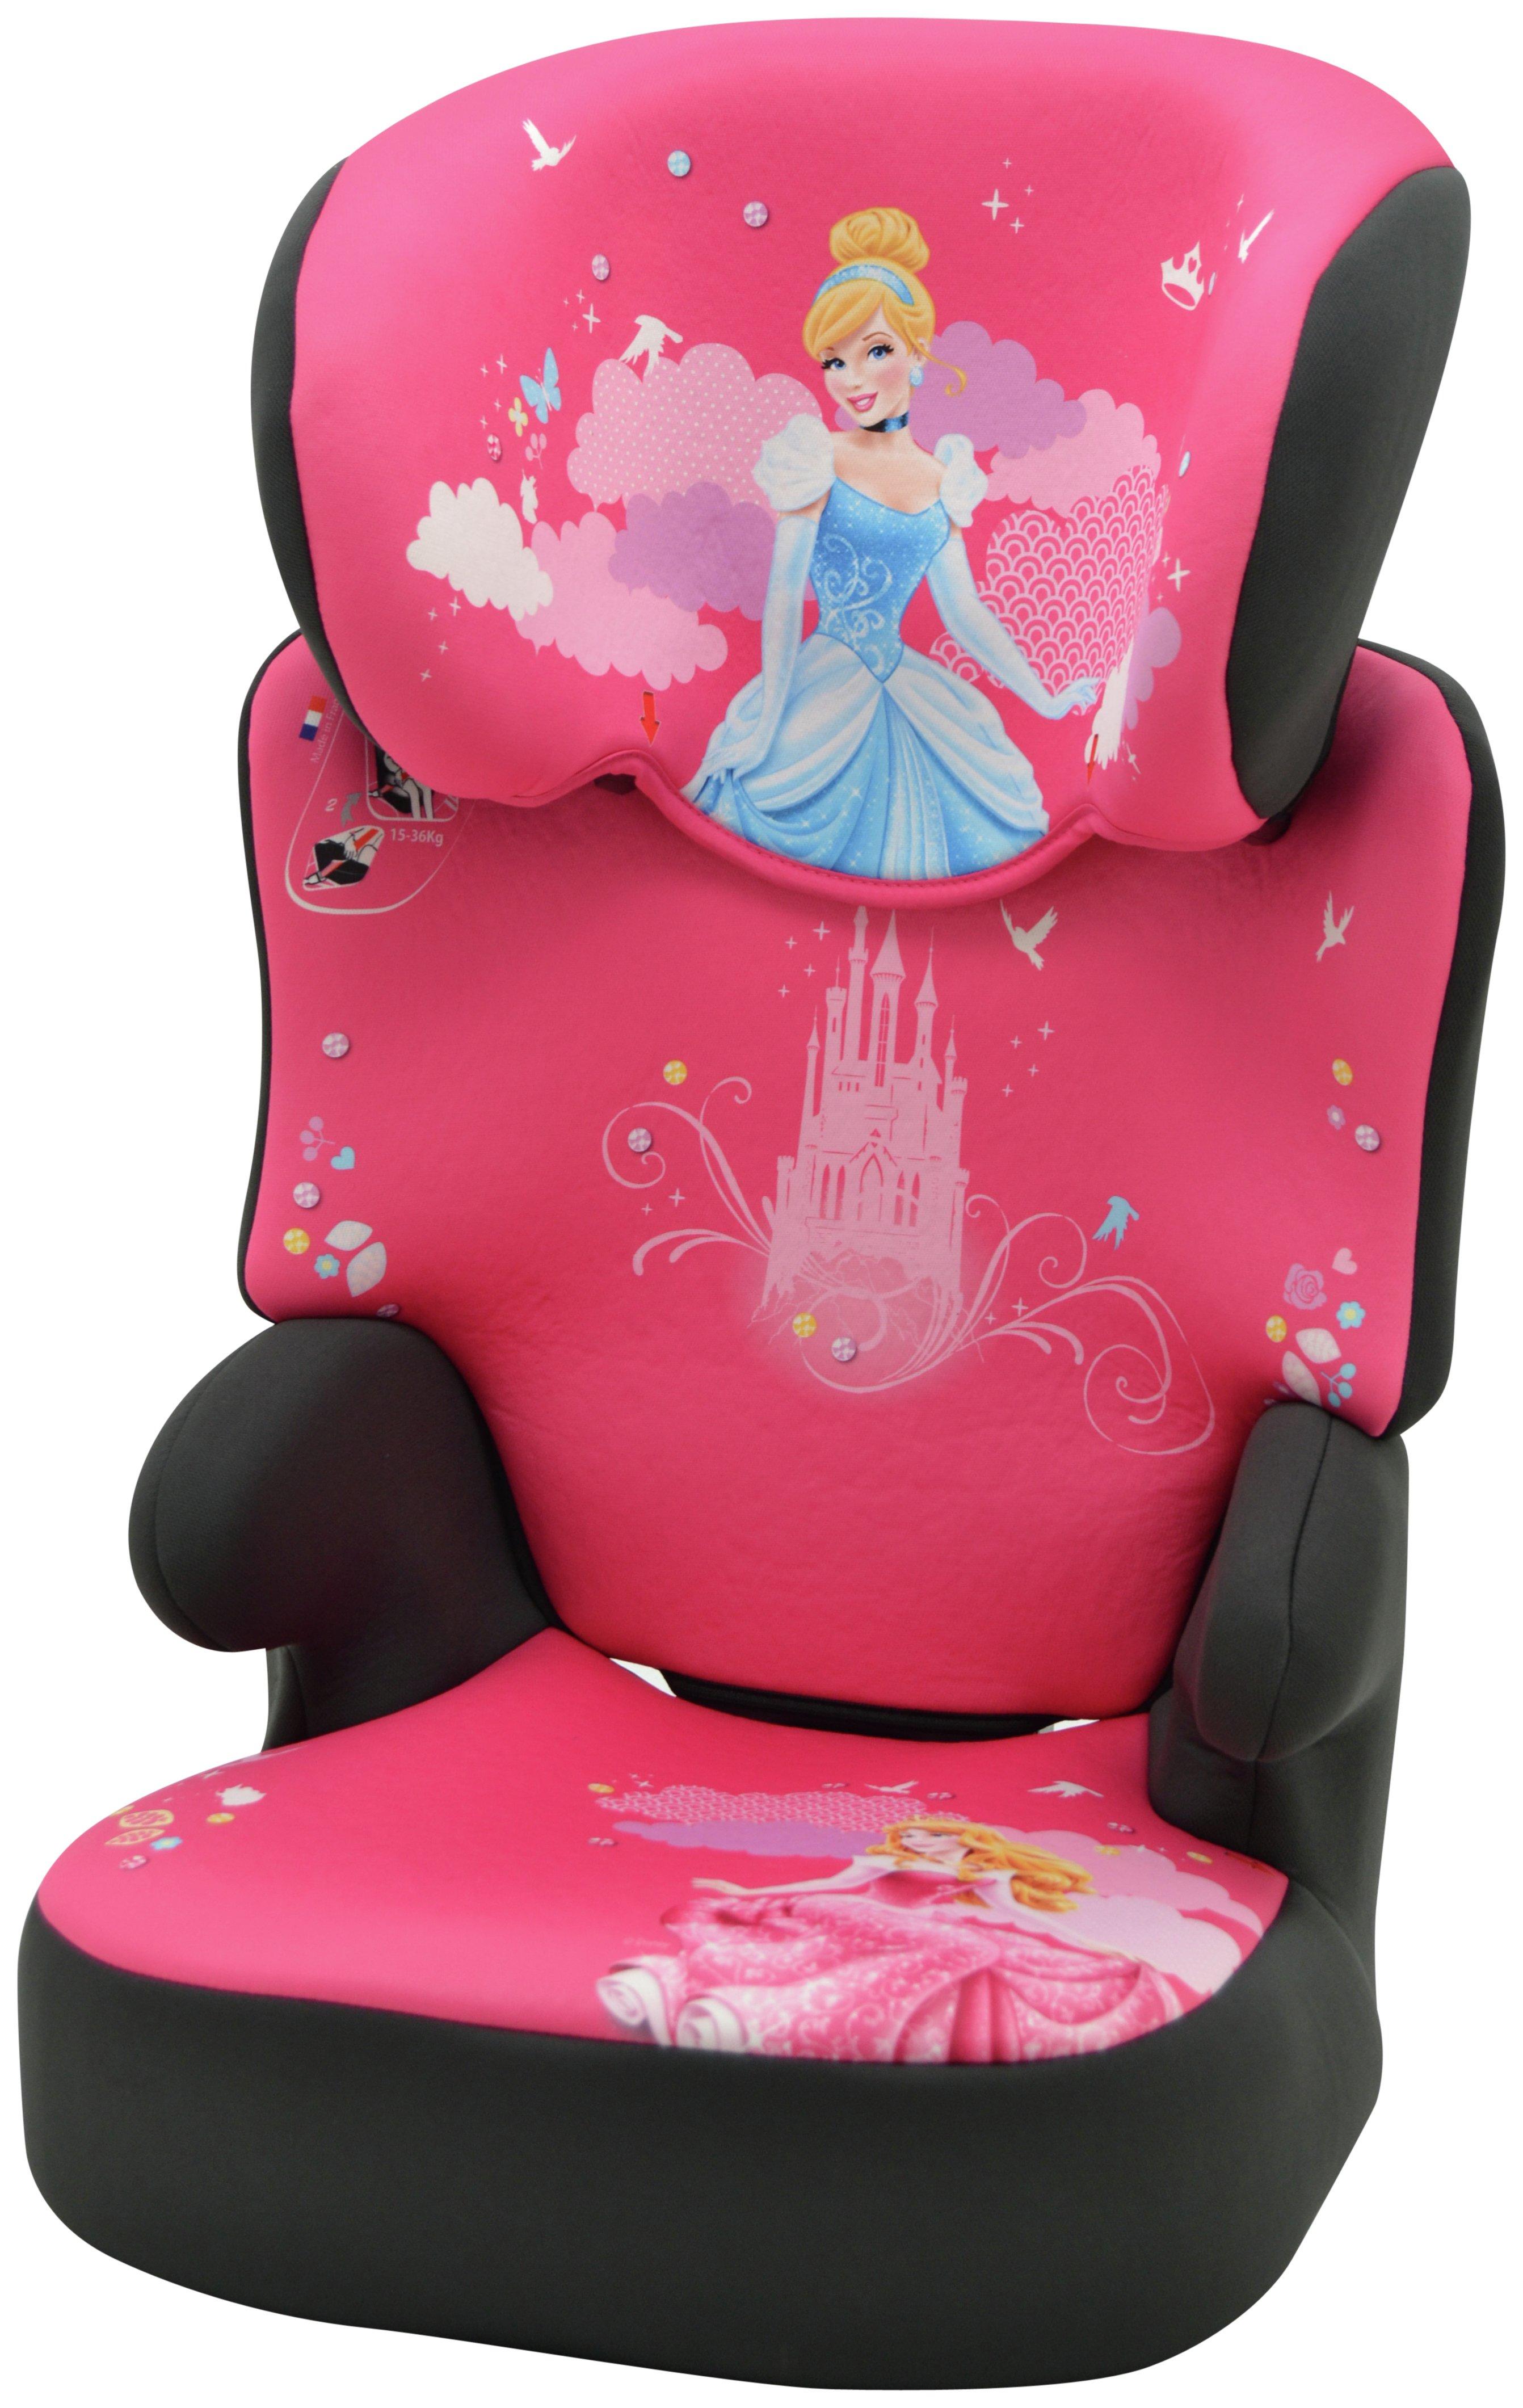 Disney Princess Groups 2/3 High Booster Car Seat - Black